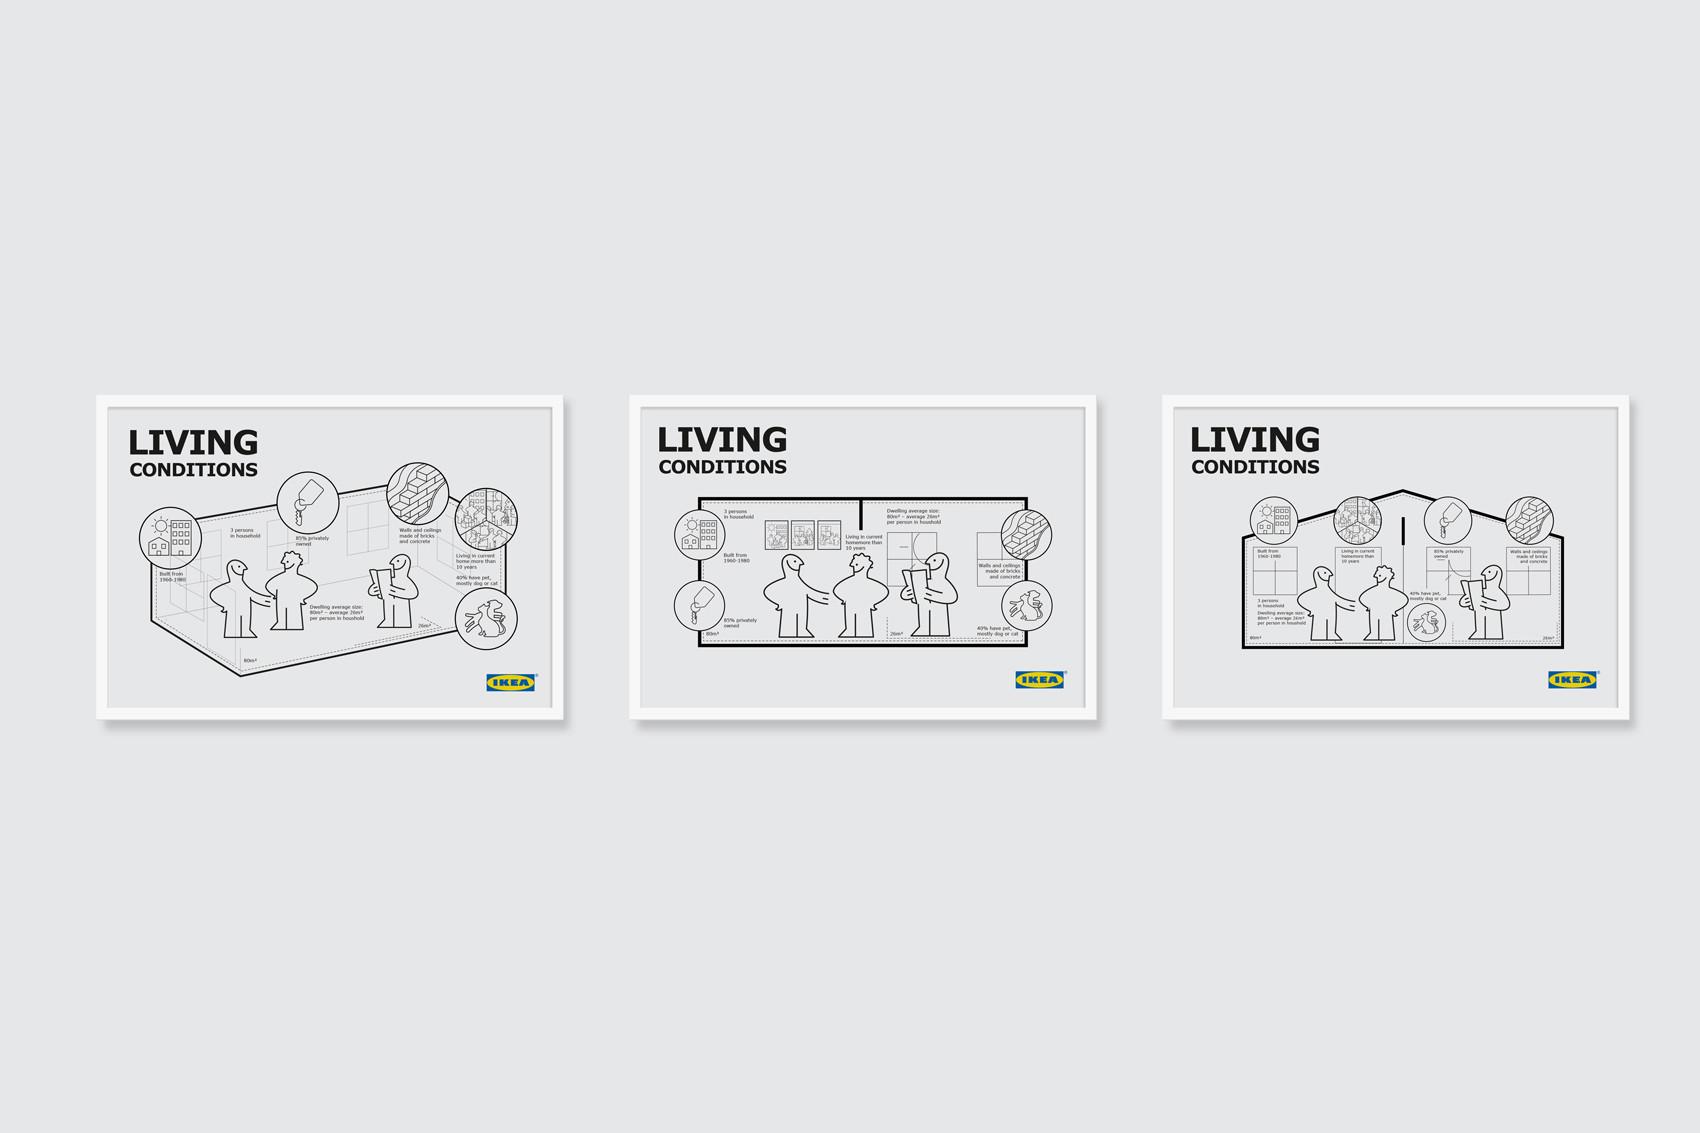 IKEA Living Conditions Design 04